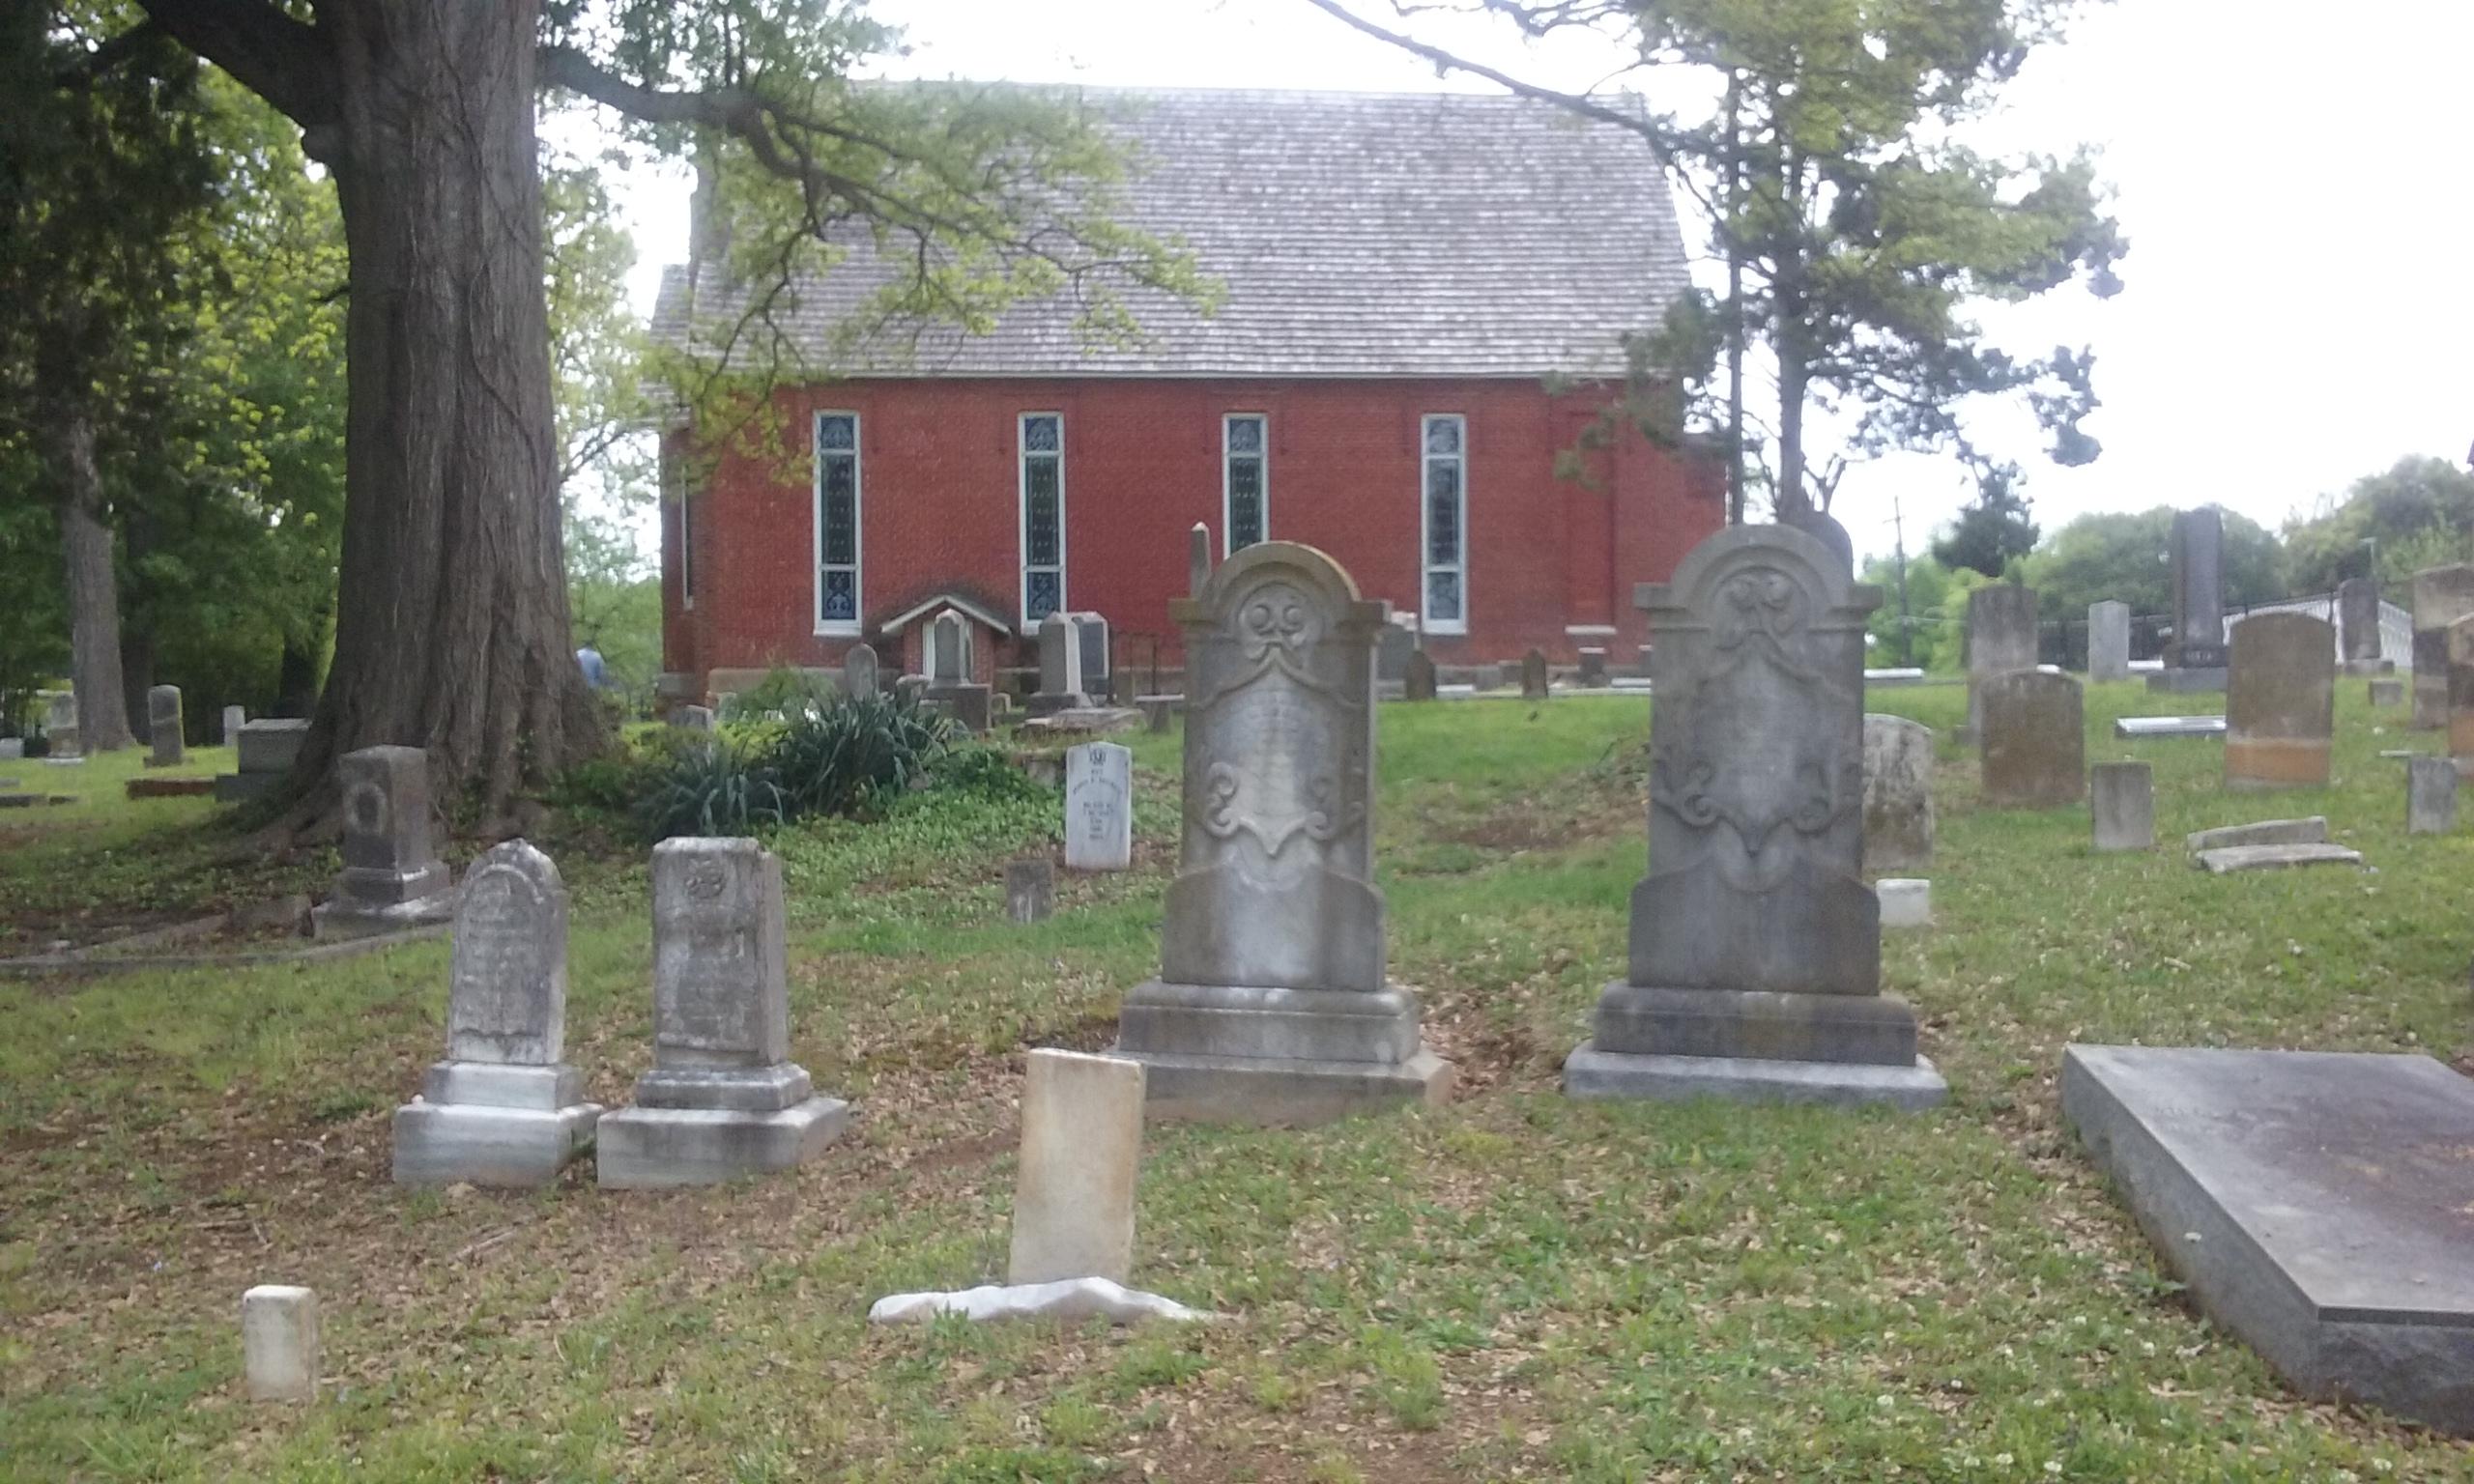 Le Olde Presbyterians - Kate Muse